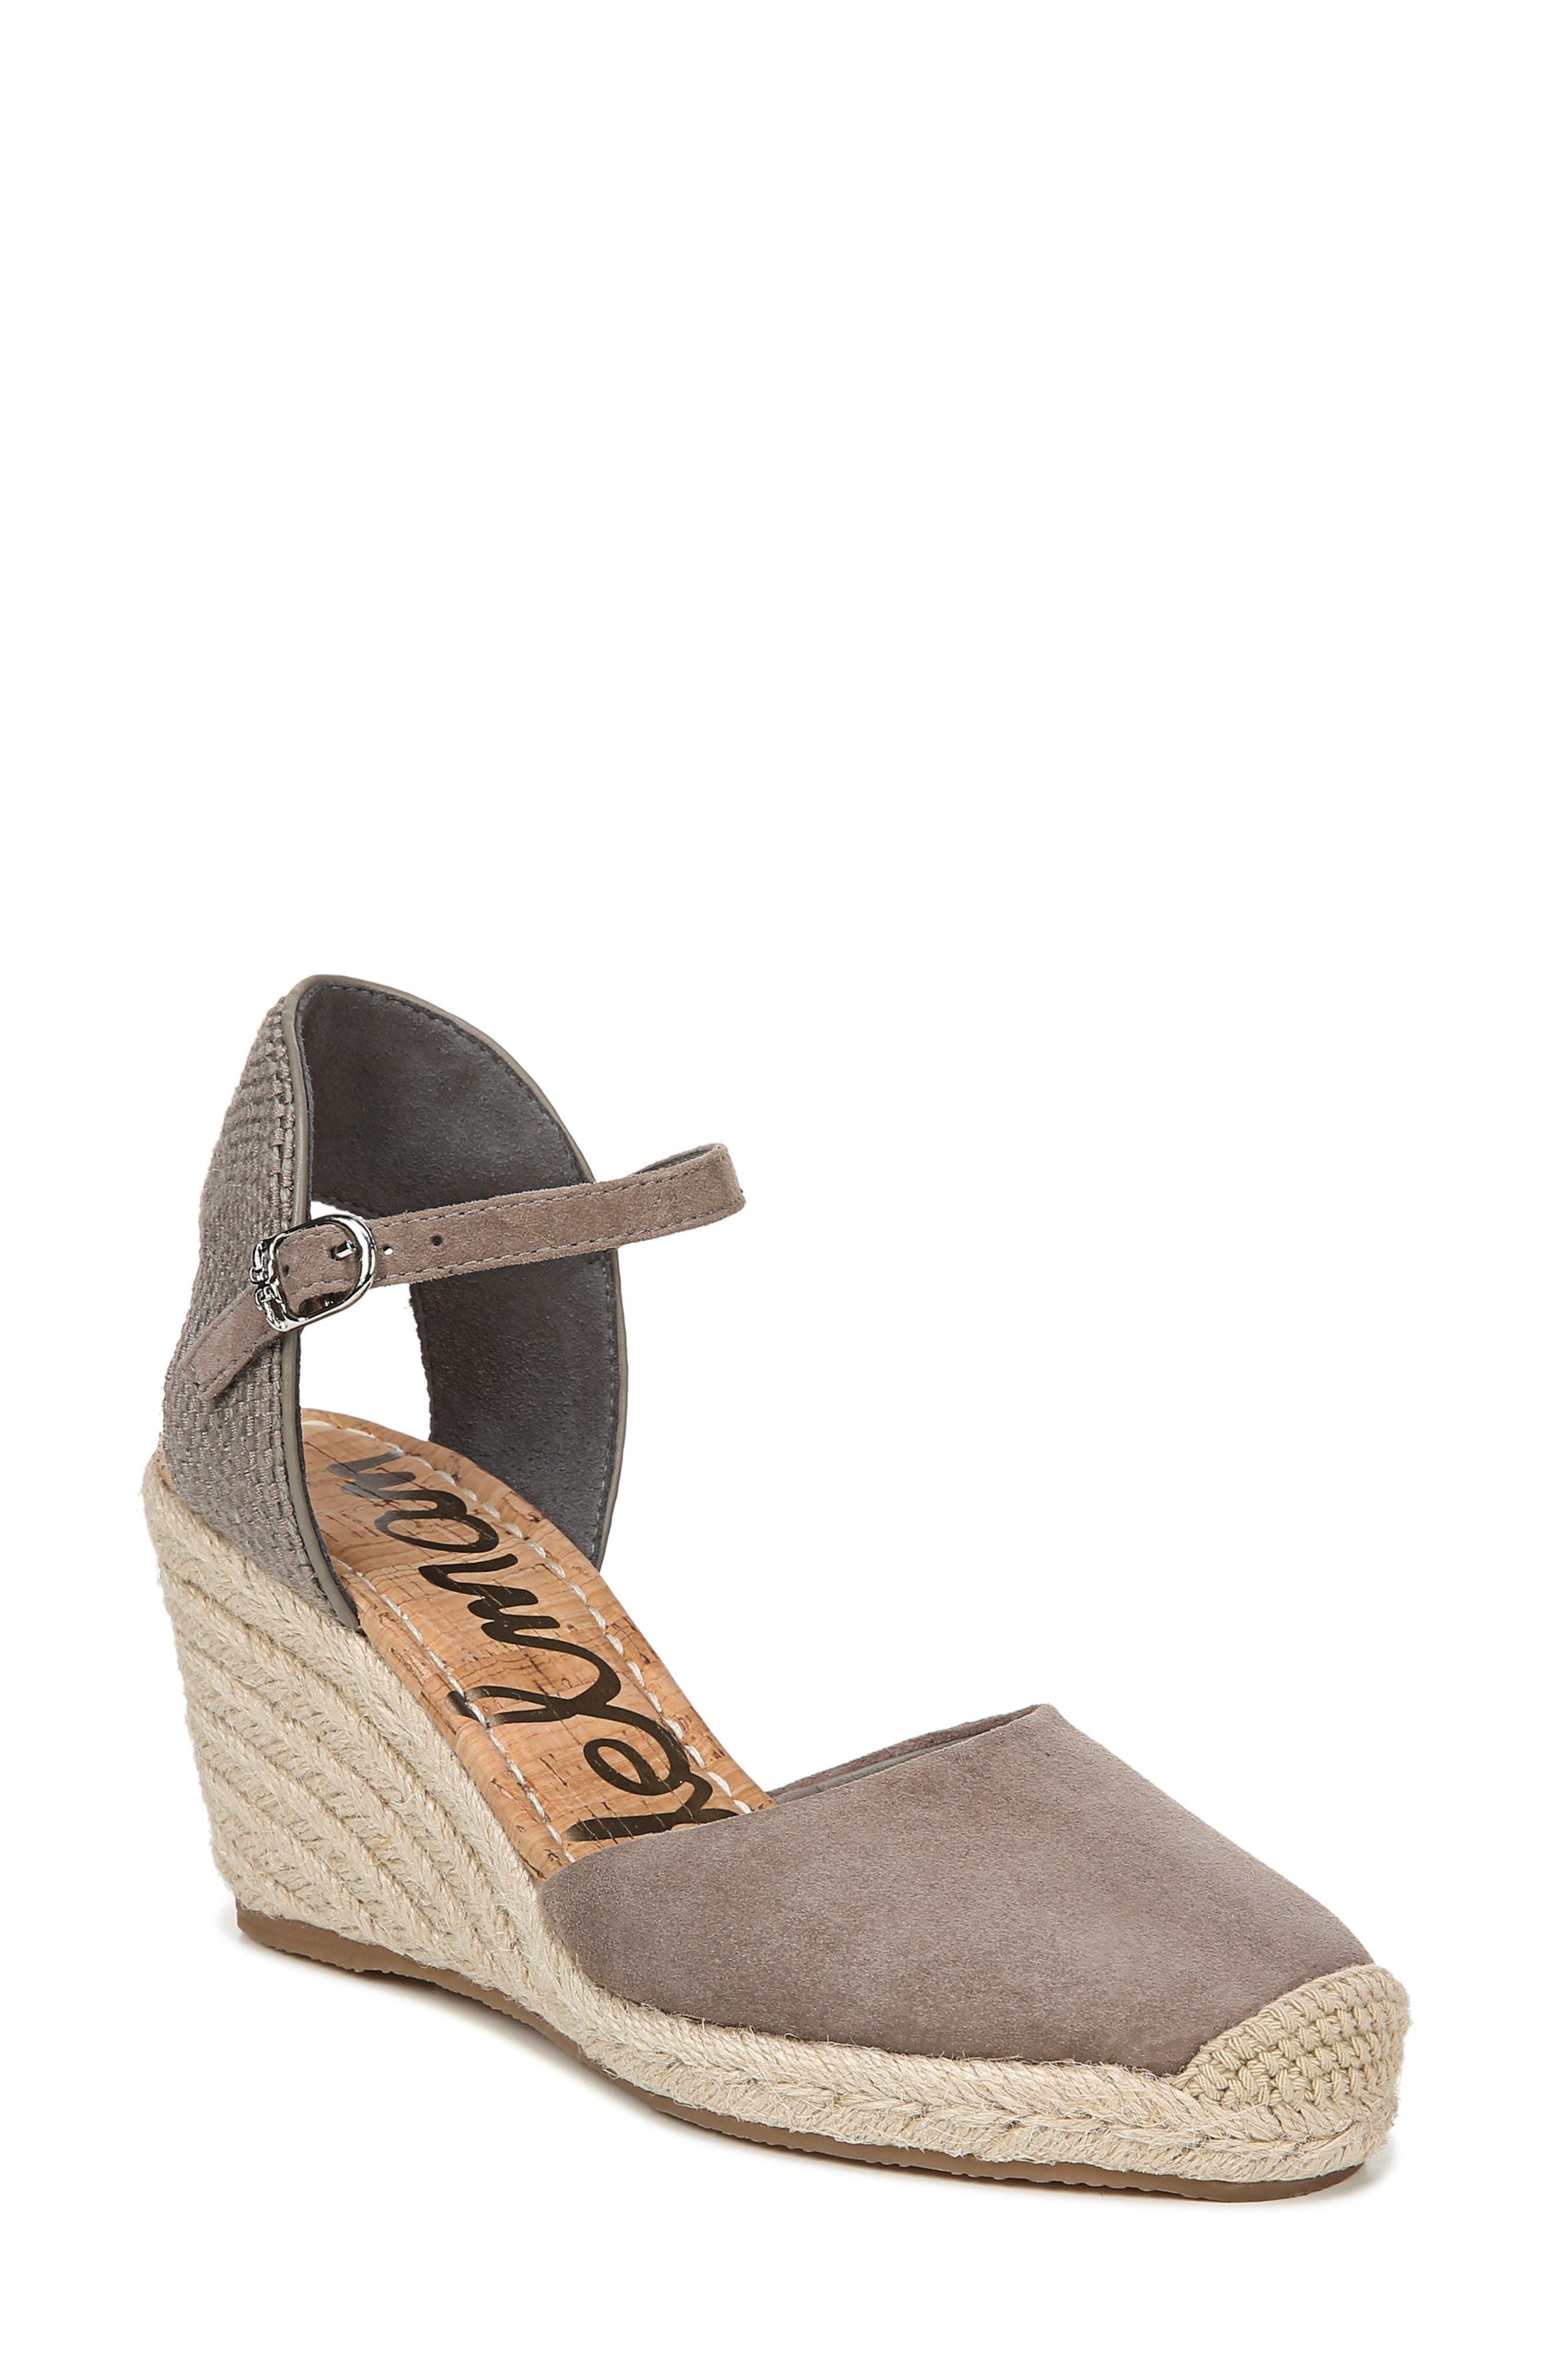 Sam Edelman Payton Wedge Sandal, Grey